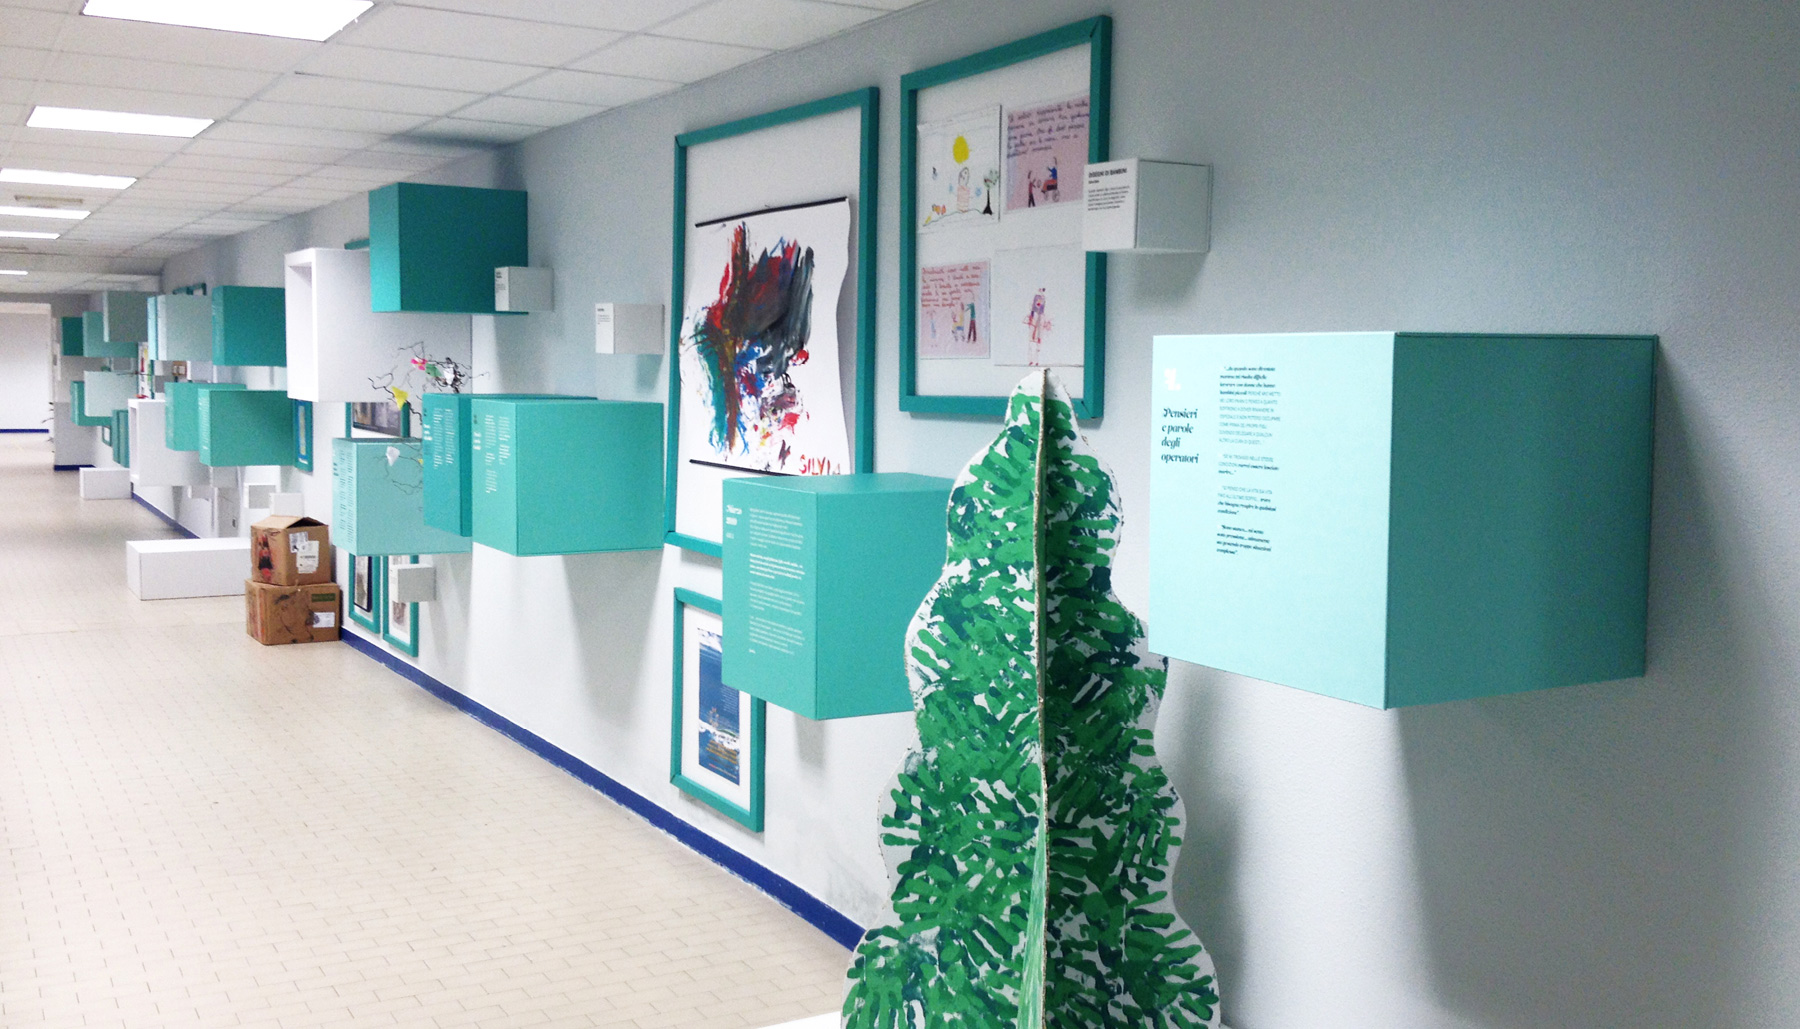 Allestimento mostra Ospedale riabilitativo Motta | Kora Comunicazione